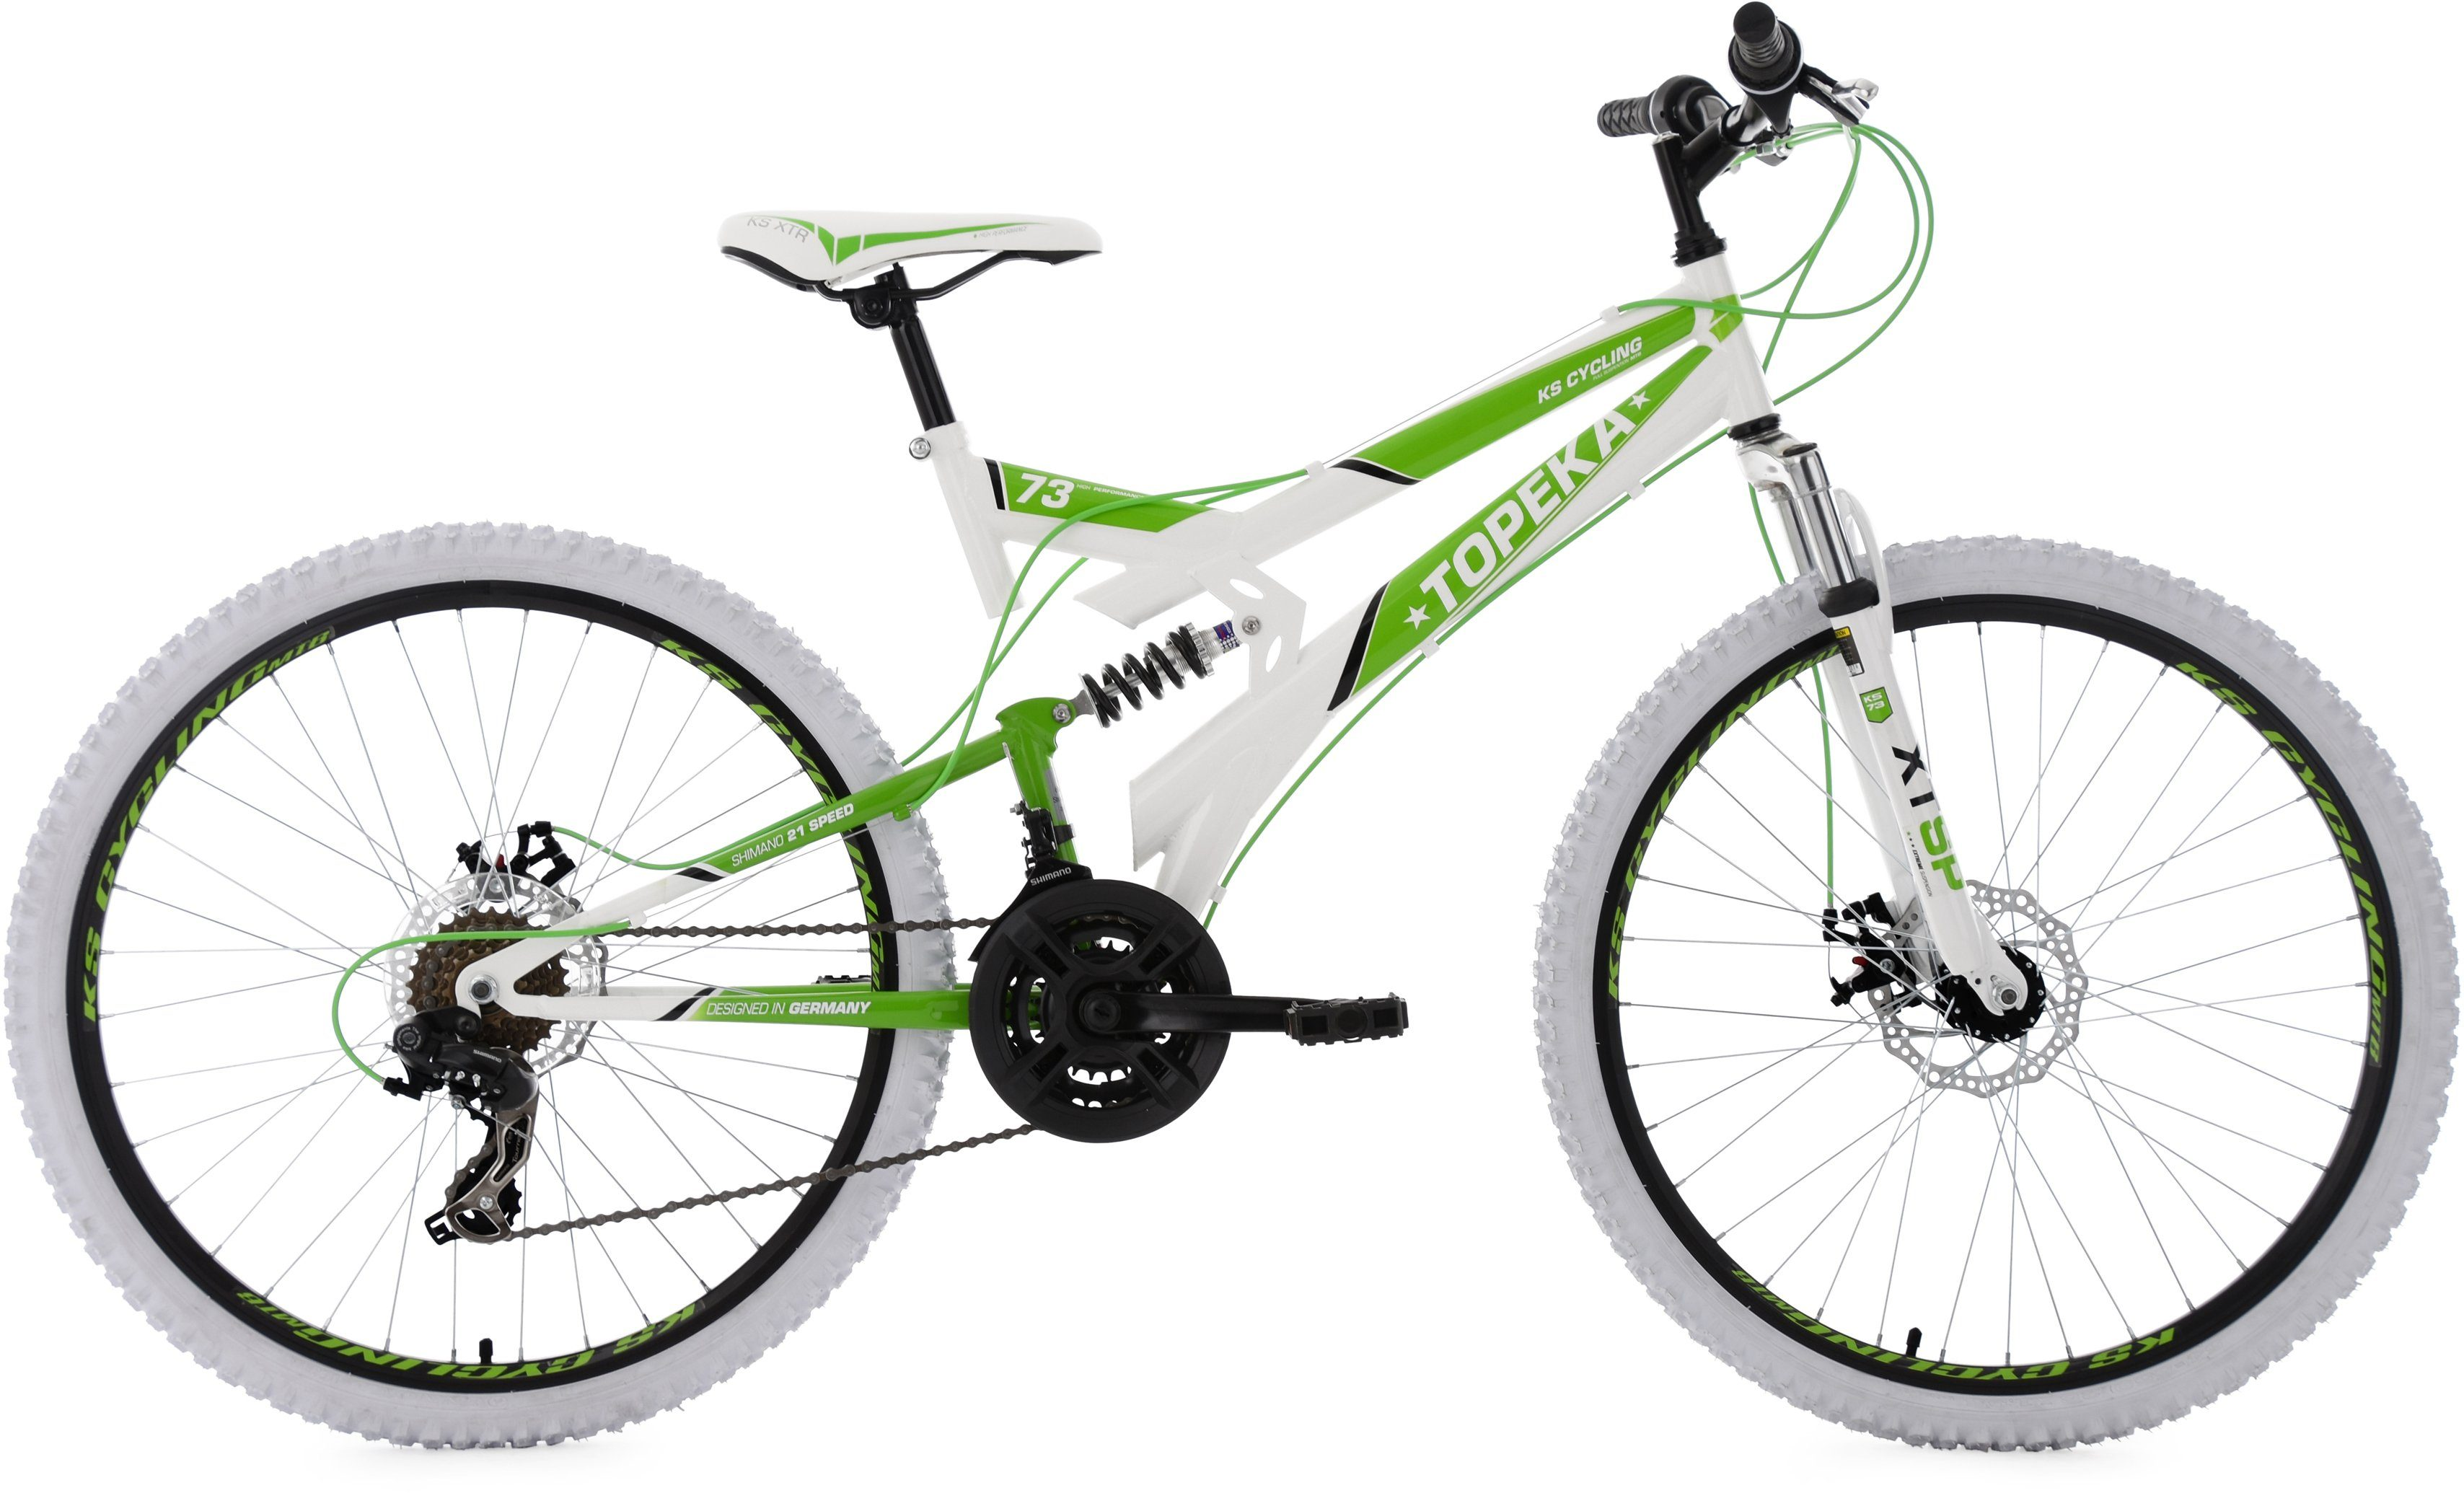 KS Cycling Fully-Mountainbike, 26 Zoll, 21 Gang-Shimano Tourney Kettenschaltung, weiß-grün, »Topeka«